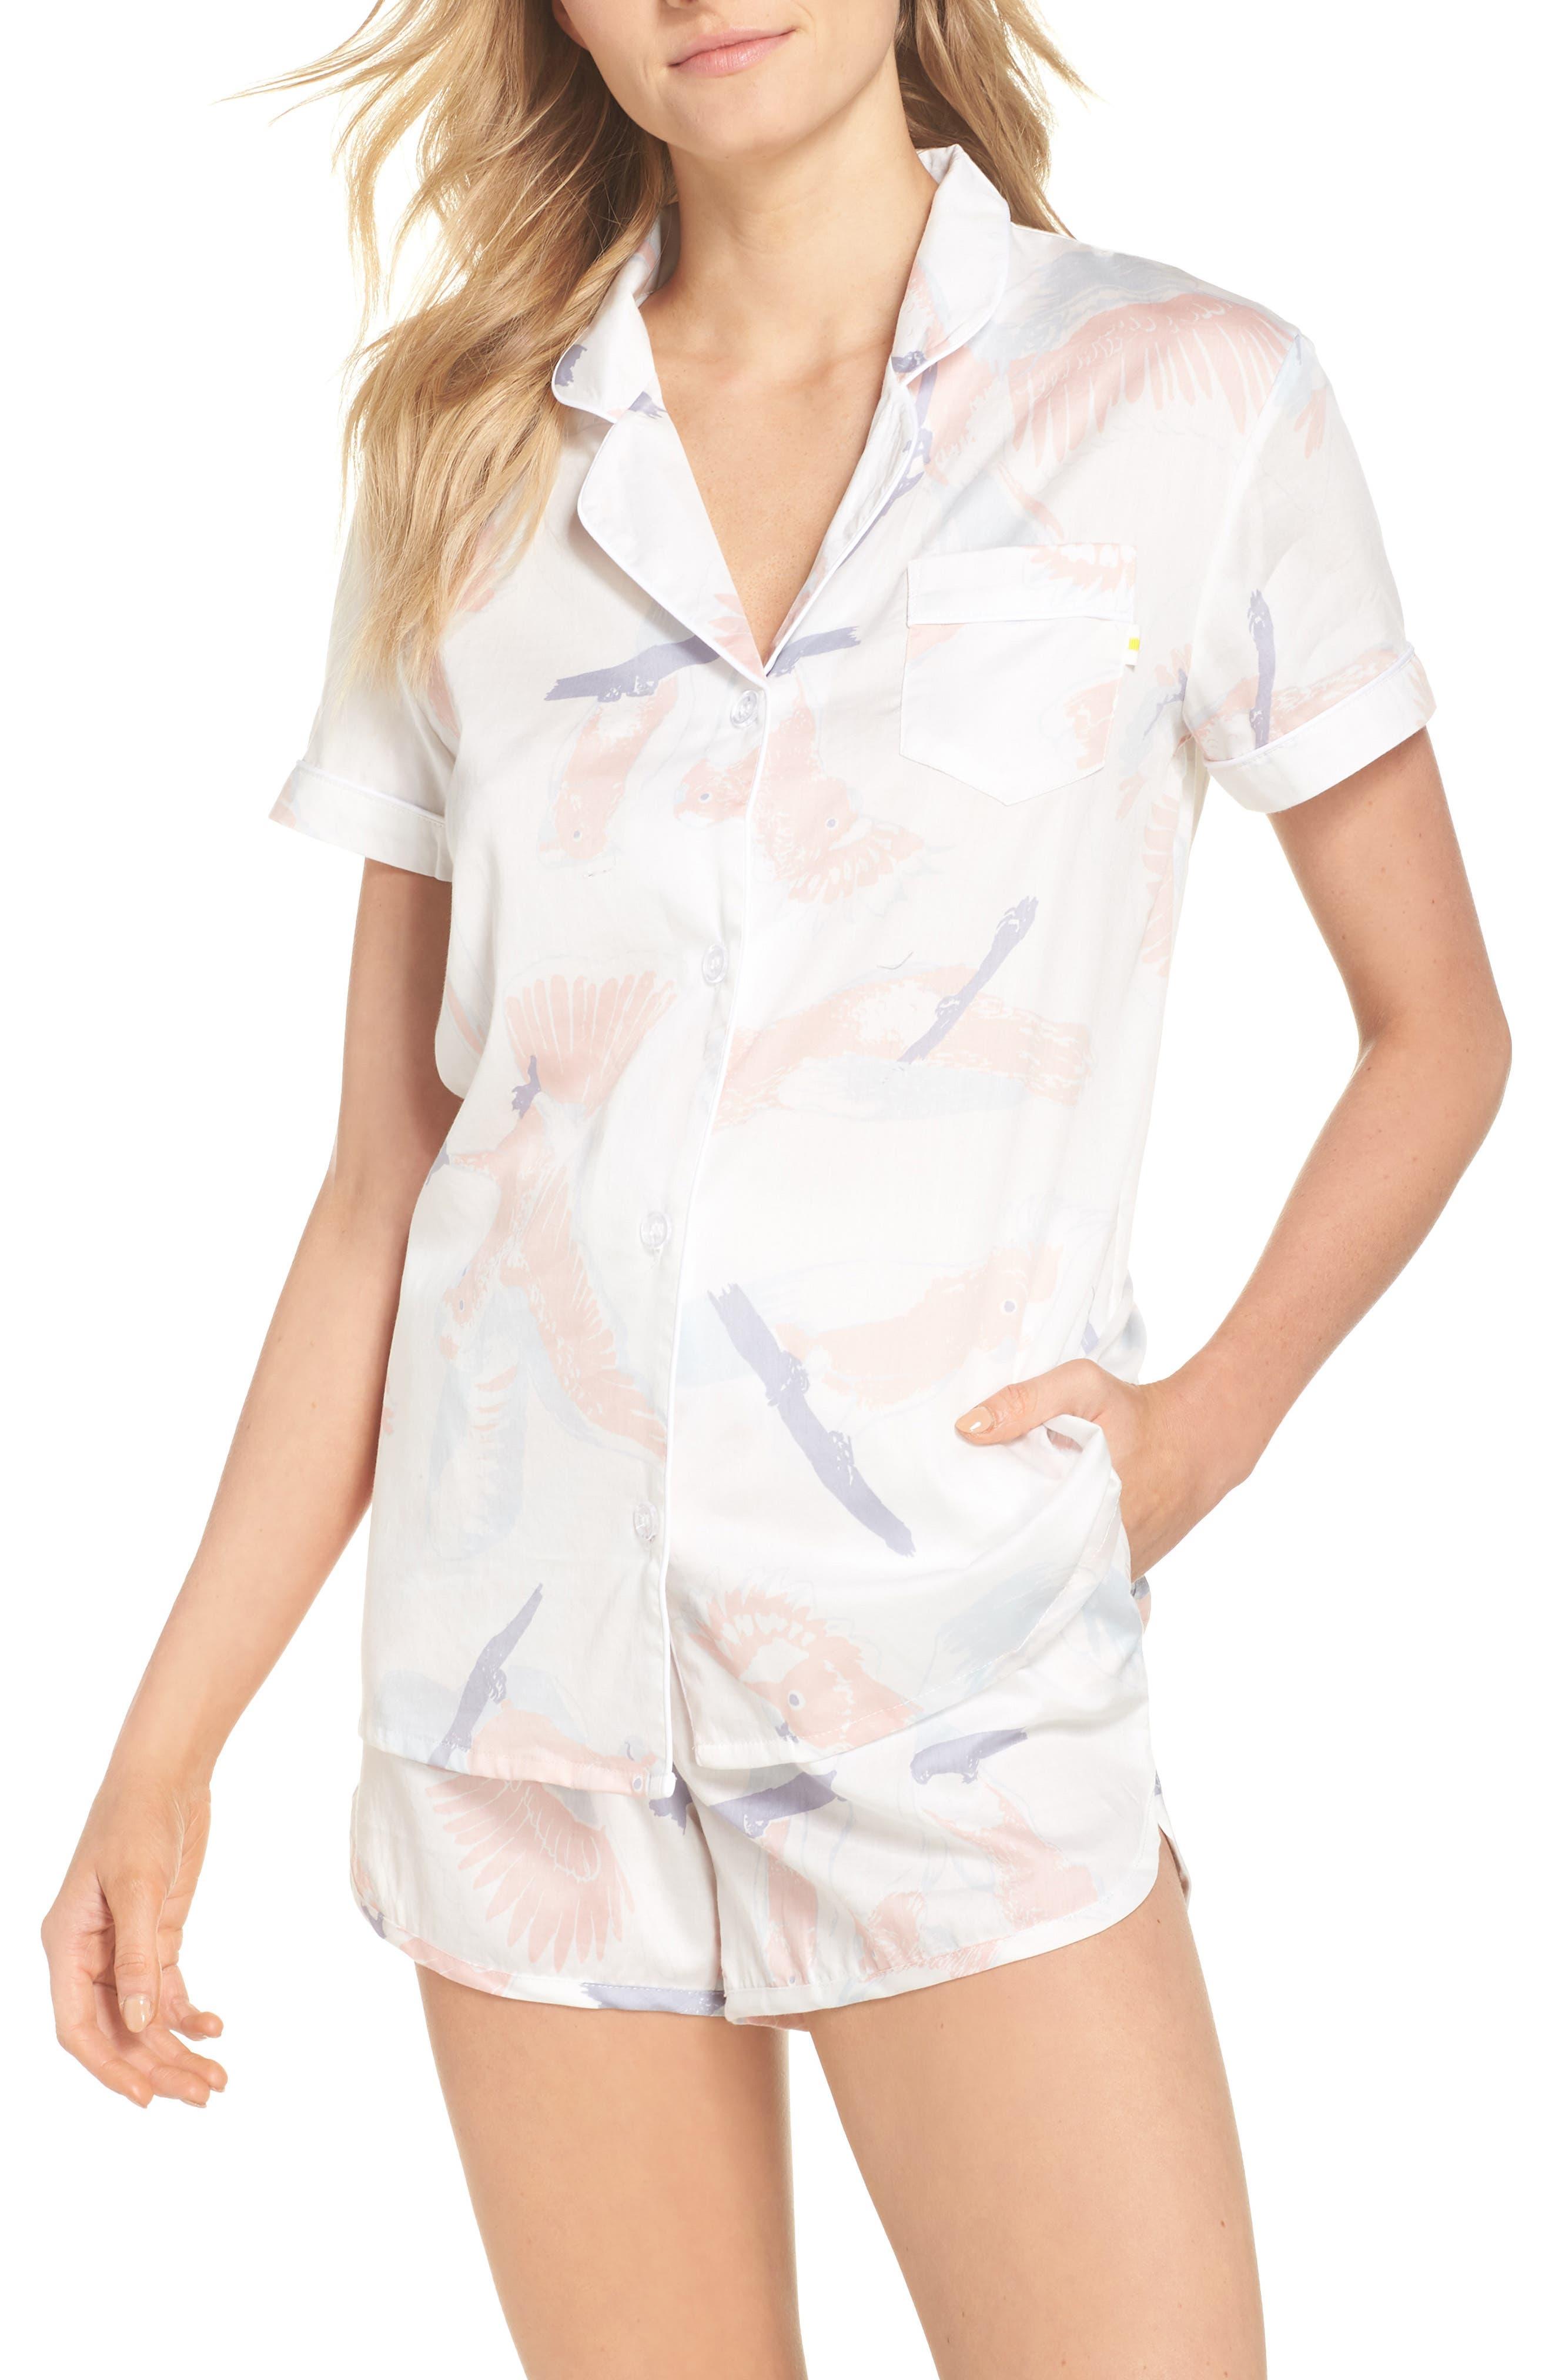 Chalmers Cockatoos Short Pajamas